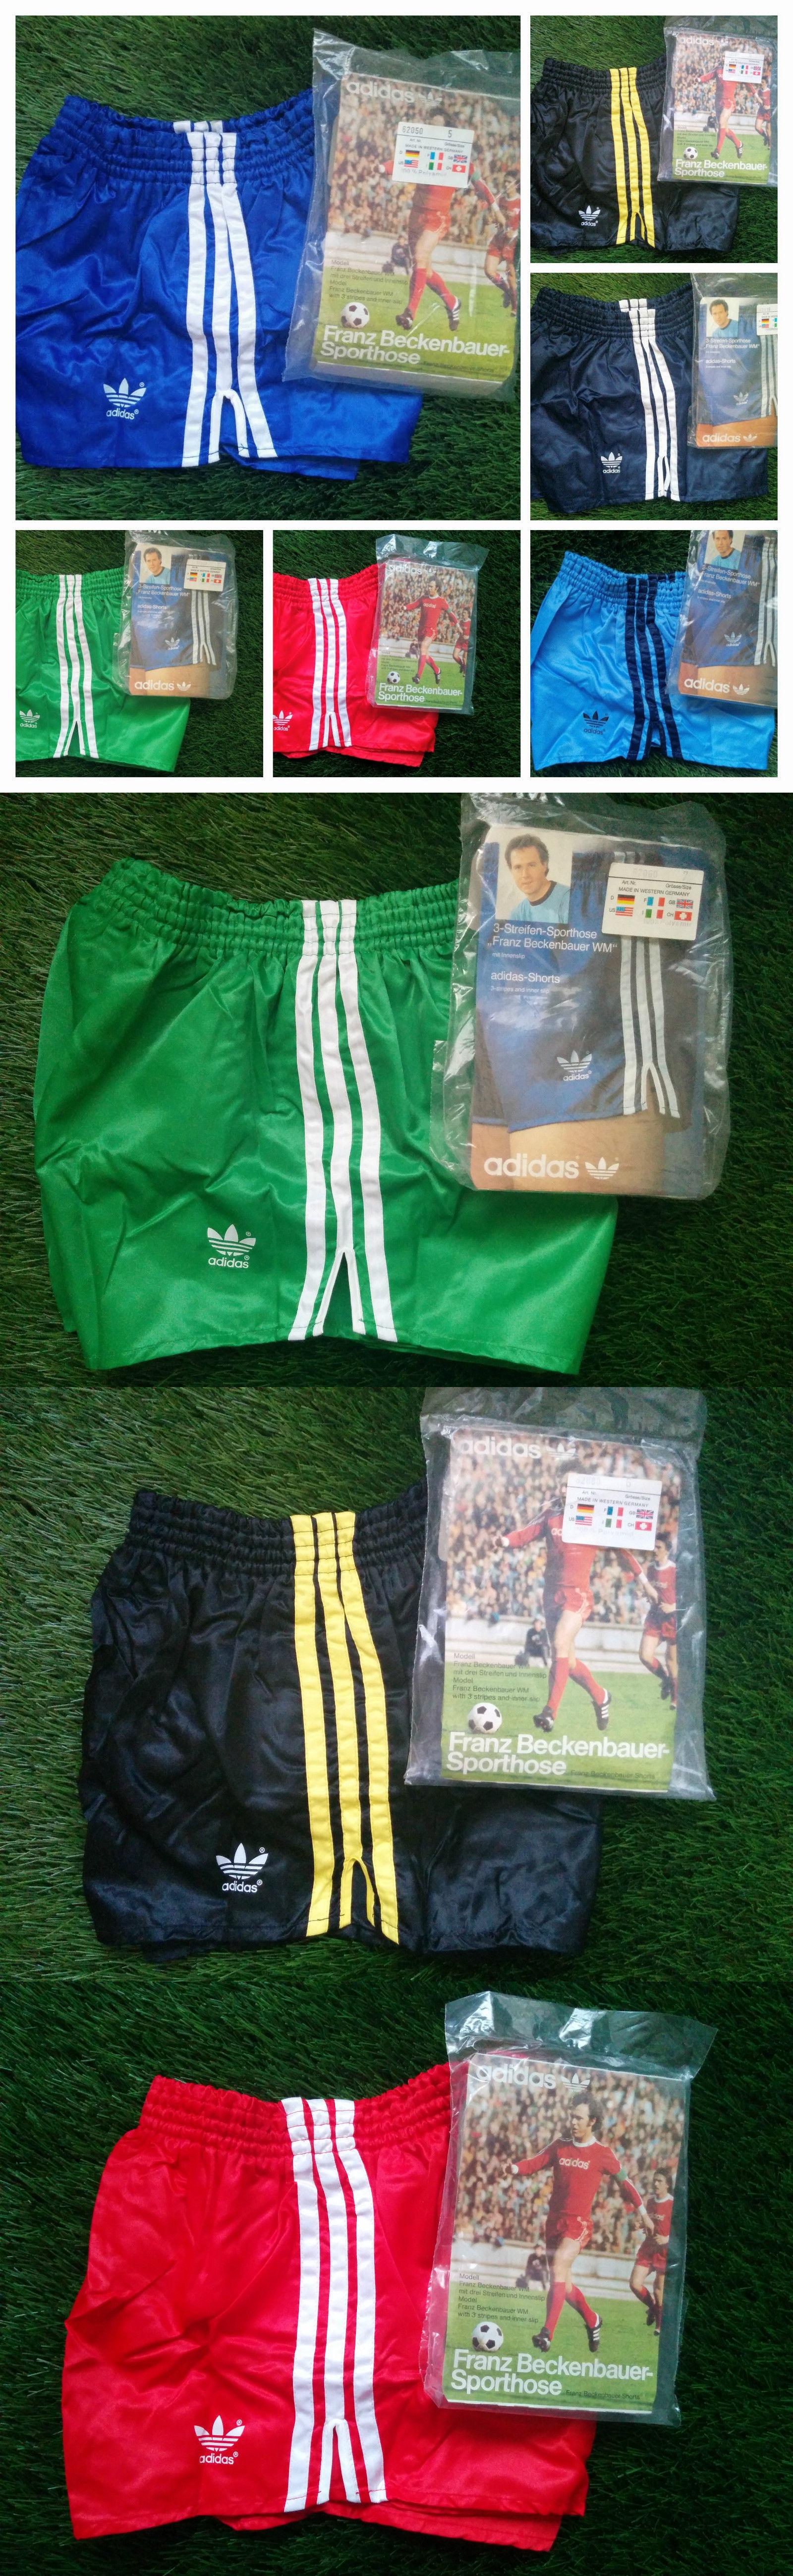 adidas retro vintage shorts